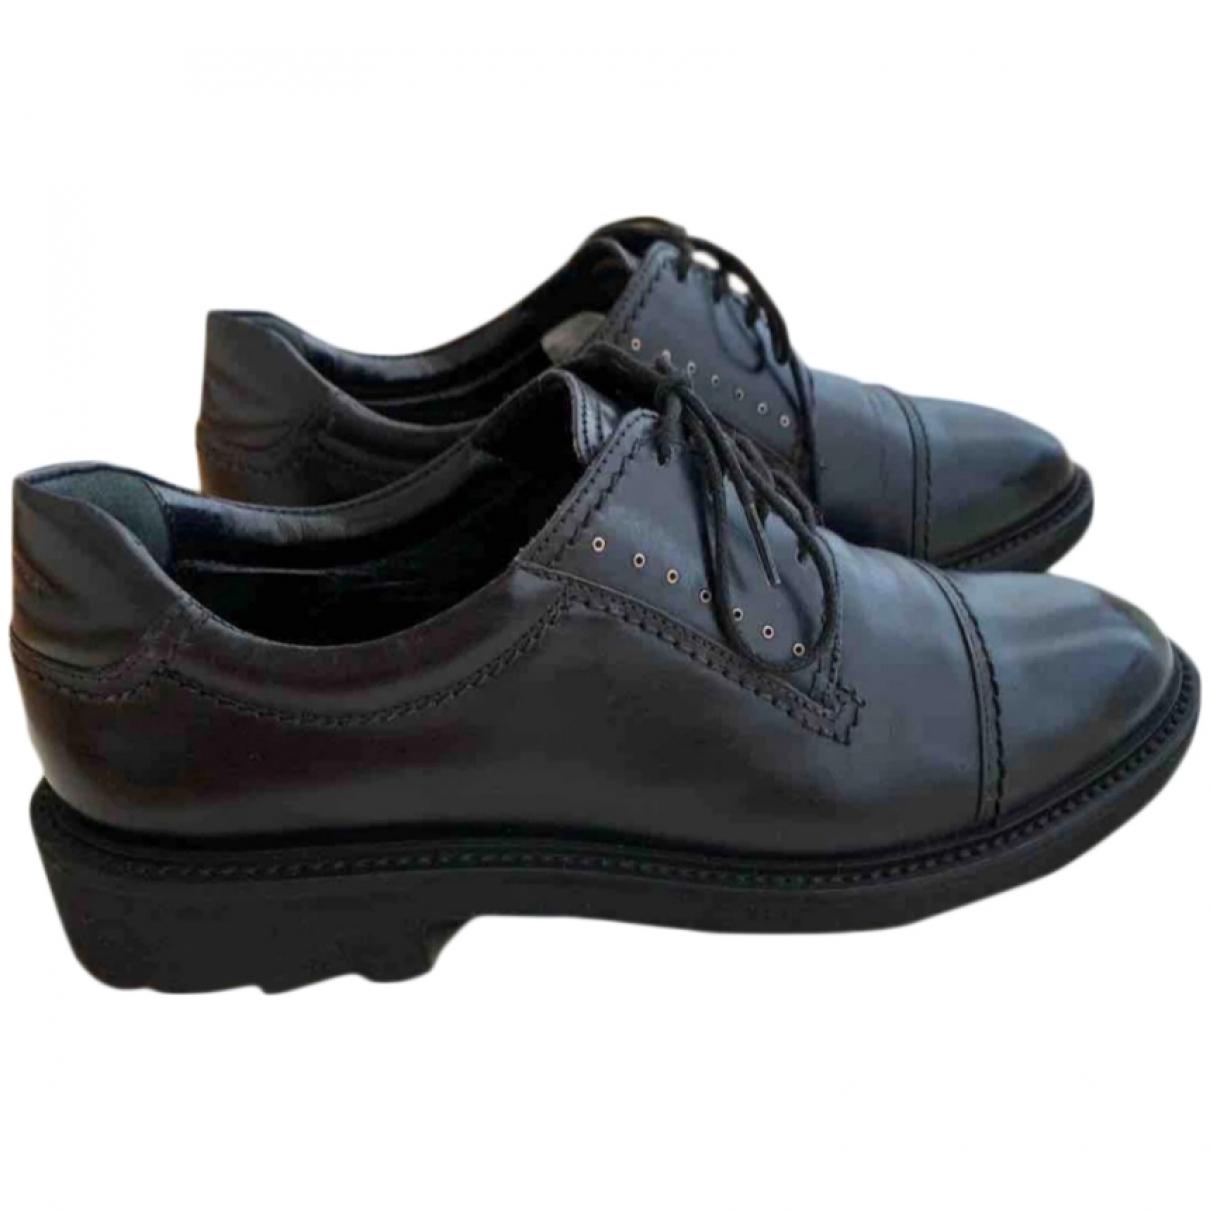 Salvatore Ferragamo \N Black Leather Lace ups for Women 36.5 EU